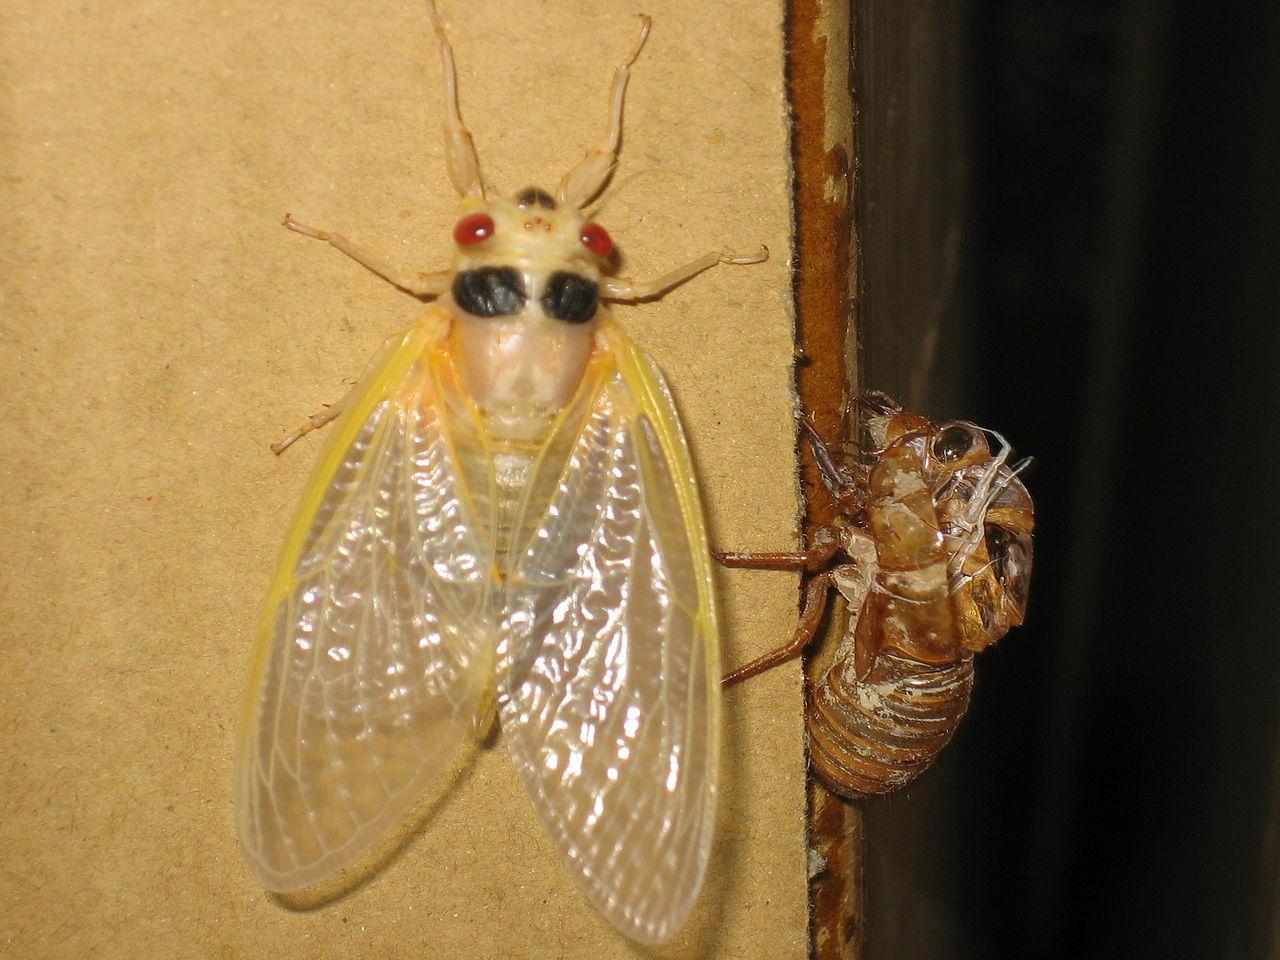 https://upload.wikimedia.org/wikipedia/commons/thumb/7/75/White_cicada.jpg/1280px-White_cicada.jpg